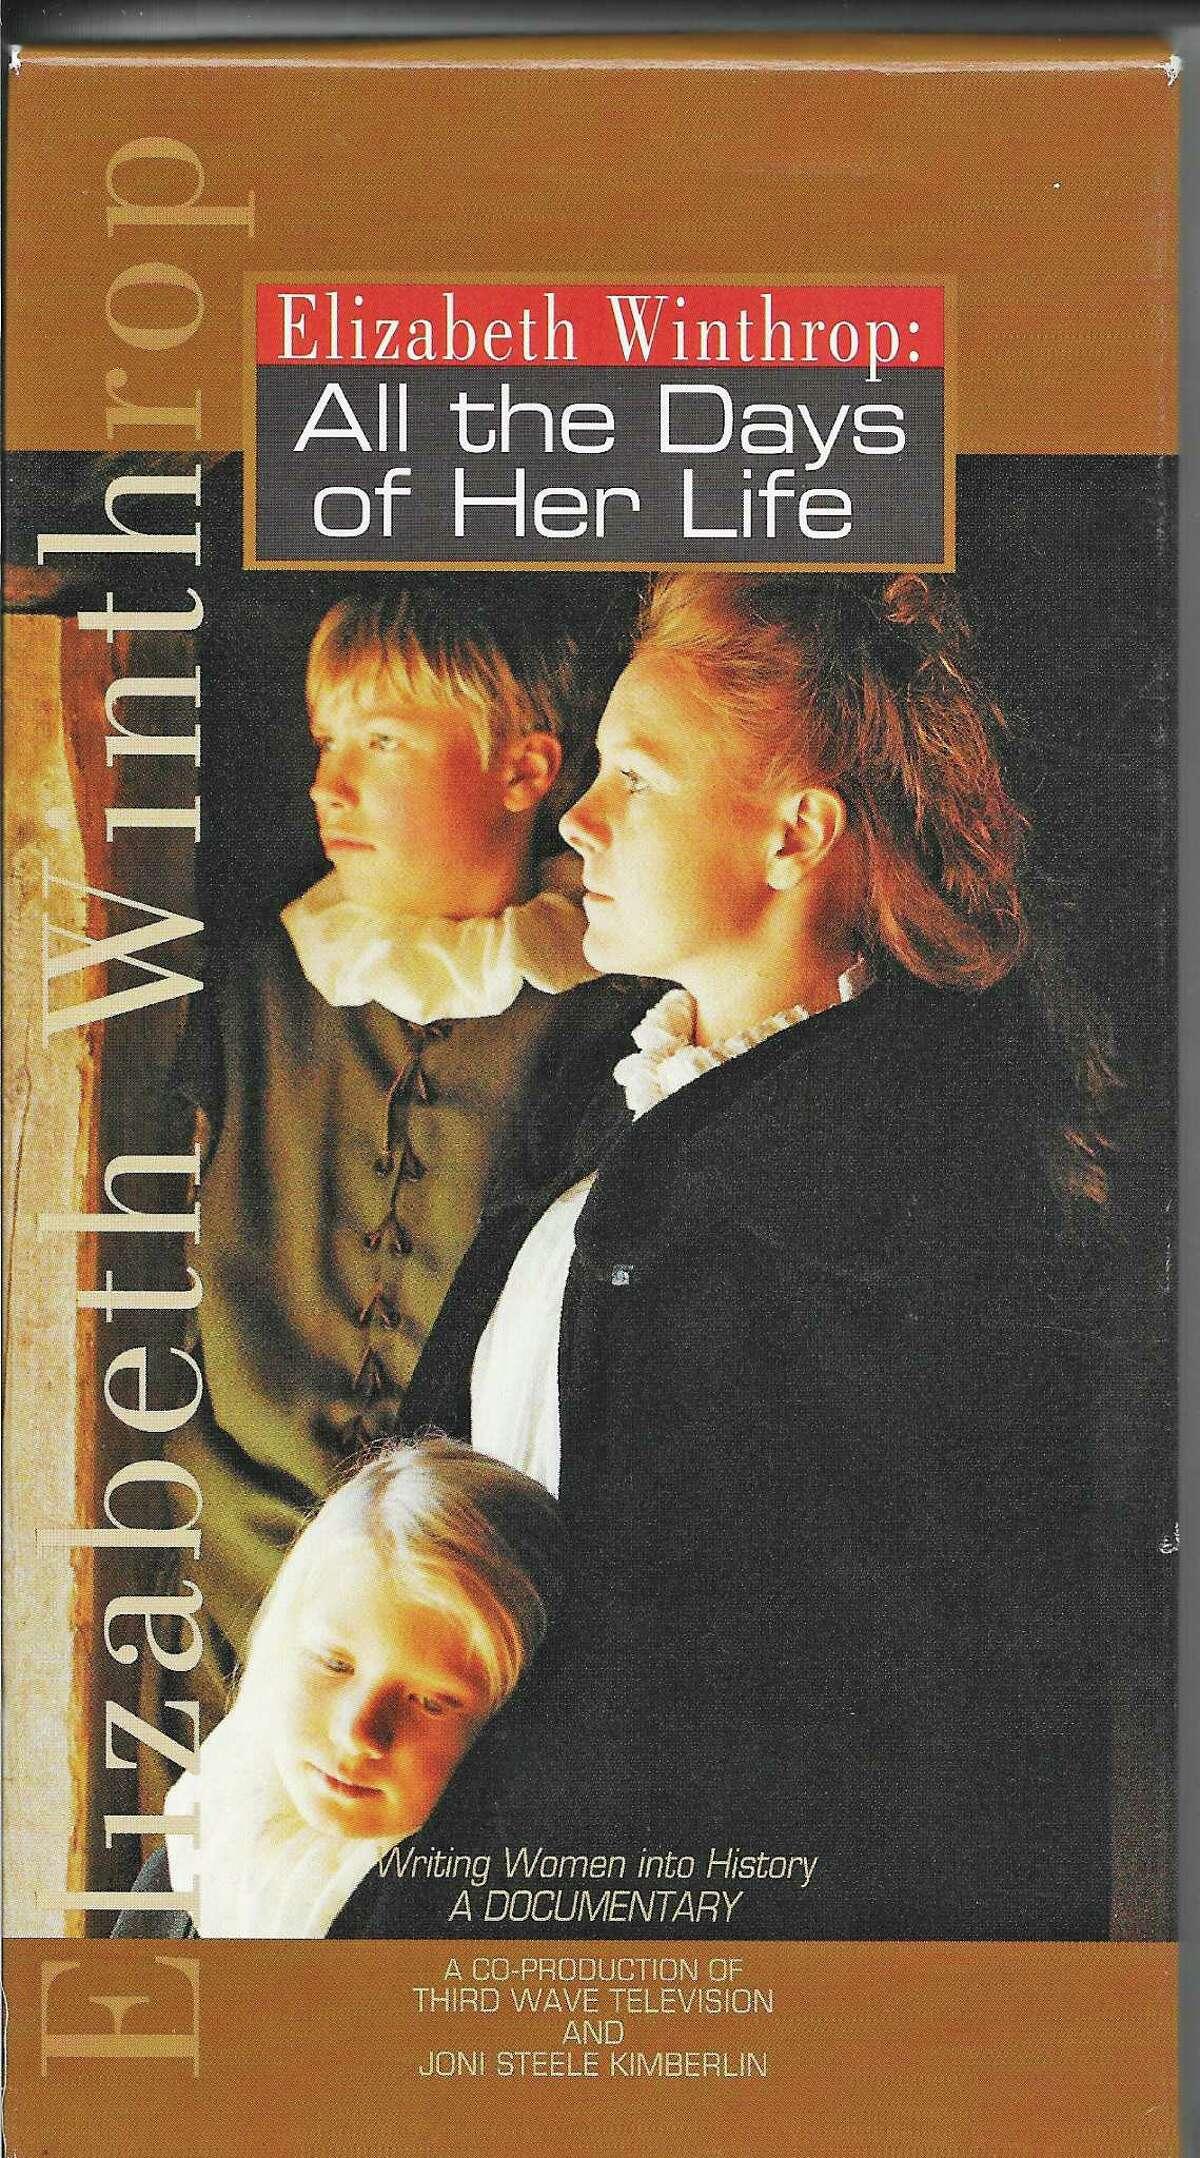 ìElizabeth Winthrop: All the Days of her Life.î